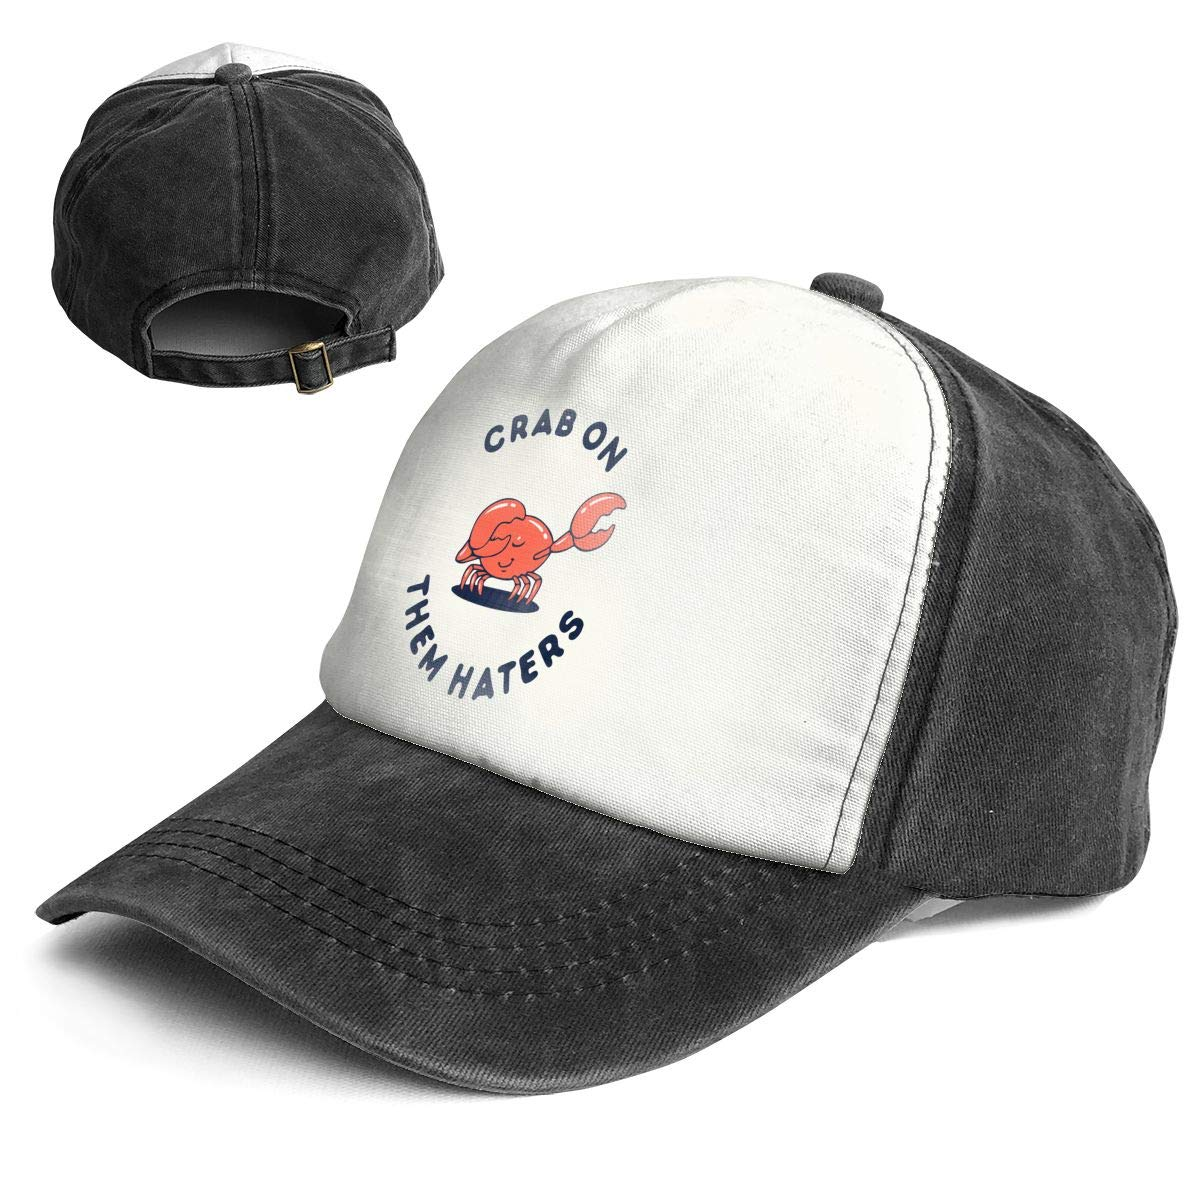 Fashion Vintage Hat Crab On Them Haters Adjustable Dad Hat Baseball Cowboy Cap